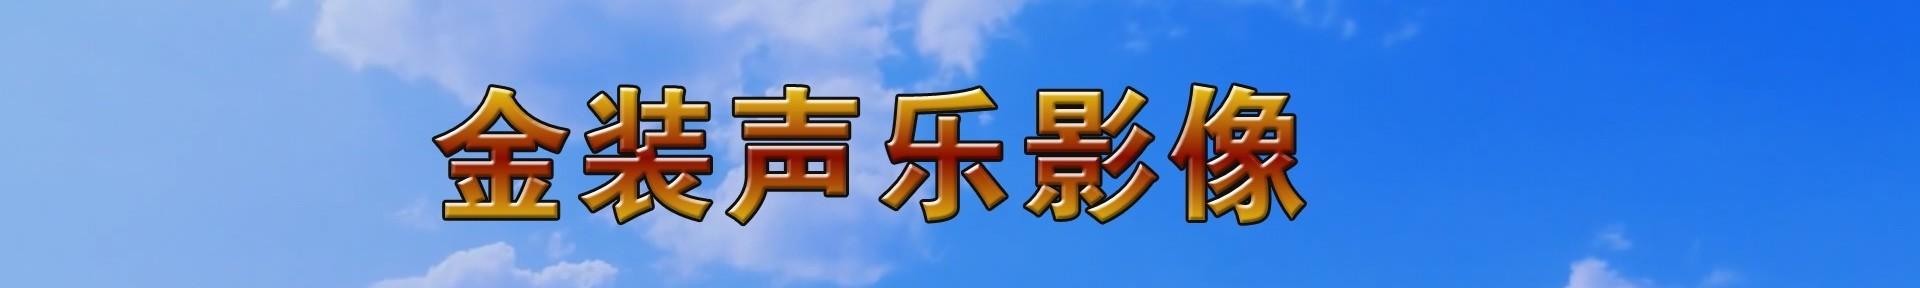 金装声乐影像 banner